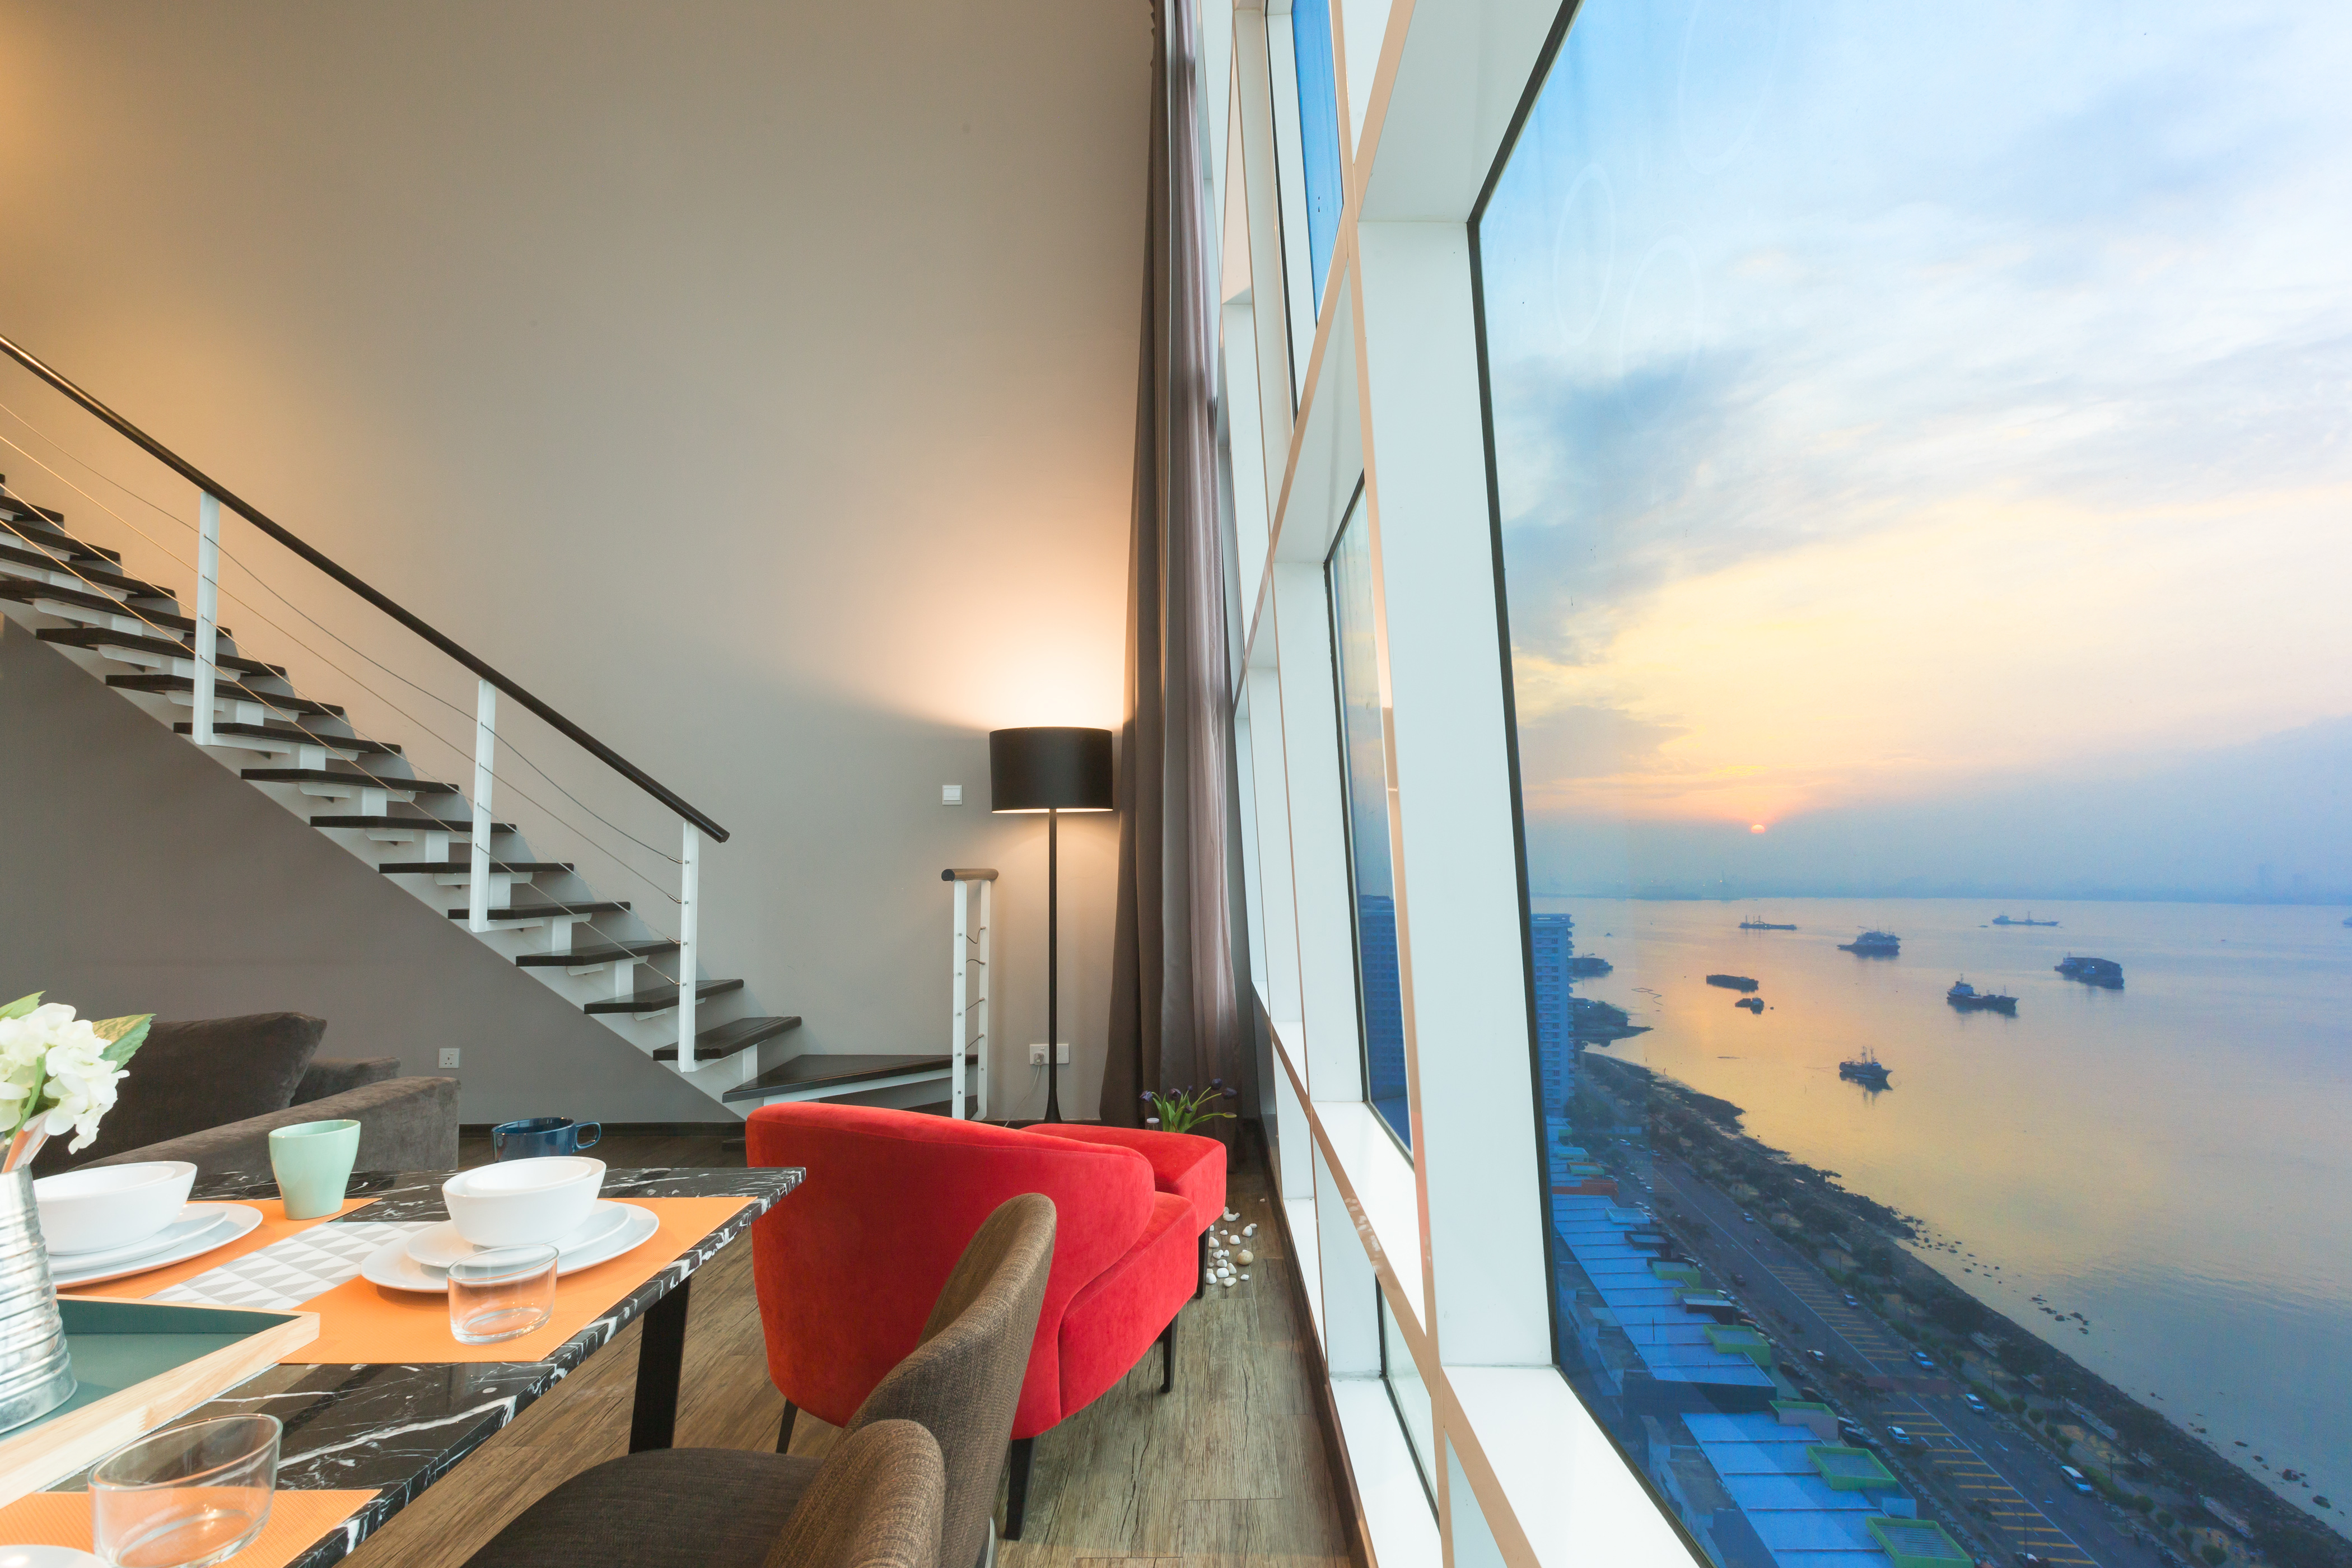 Neu Maritime Duplex-Suite mit Meerblick Neues Luxus-Duplex-Loft mit Meerblick